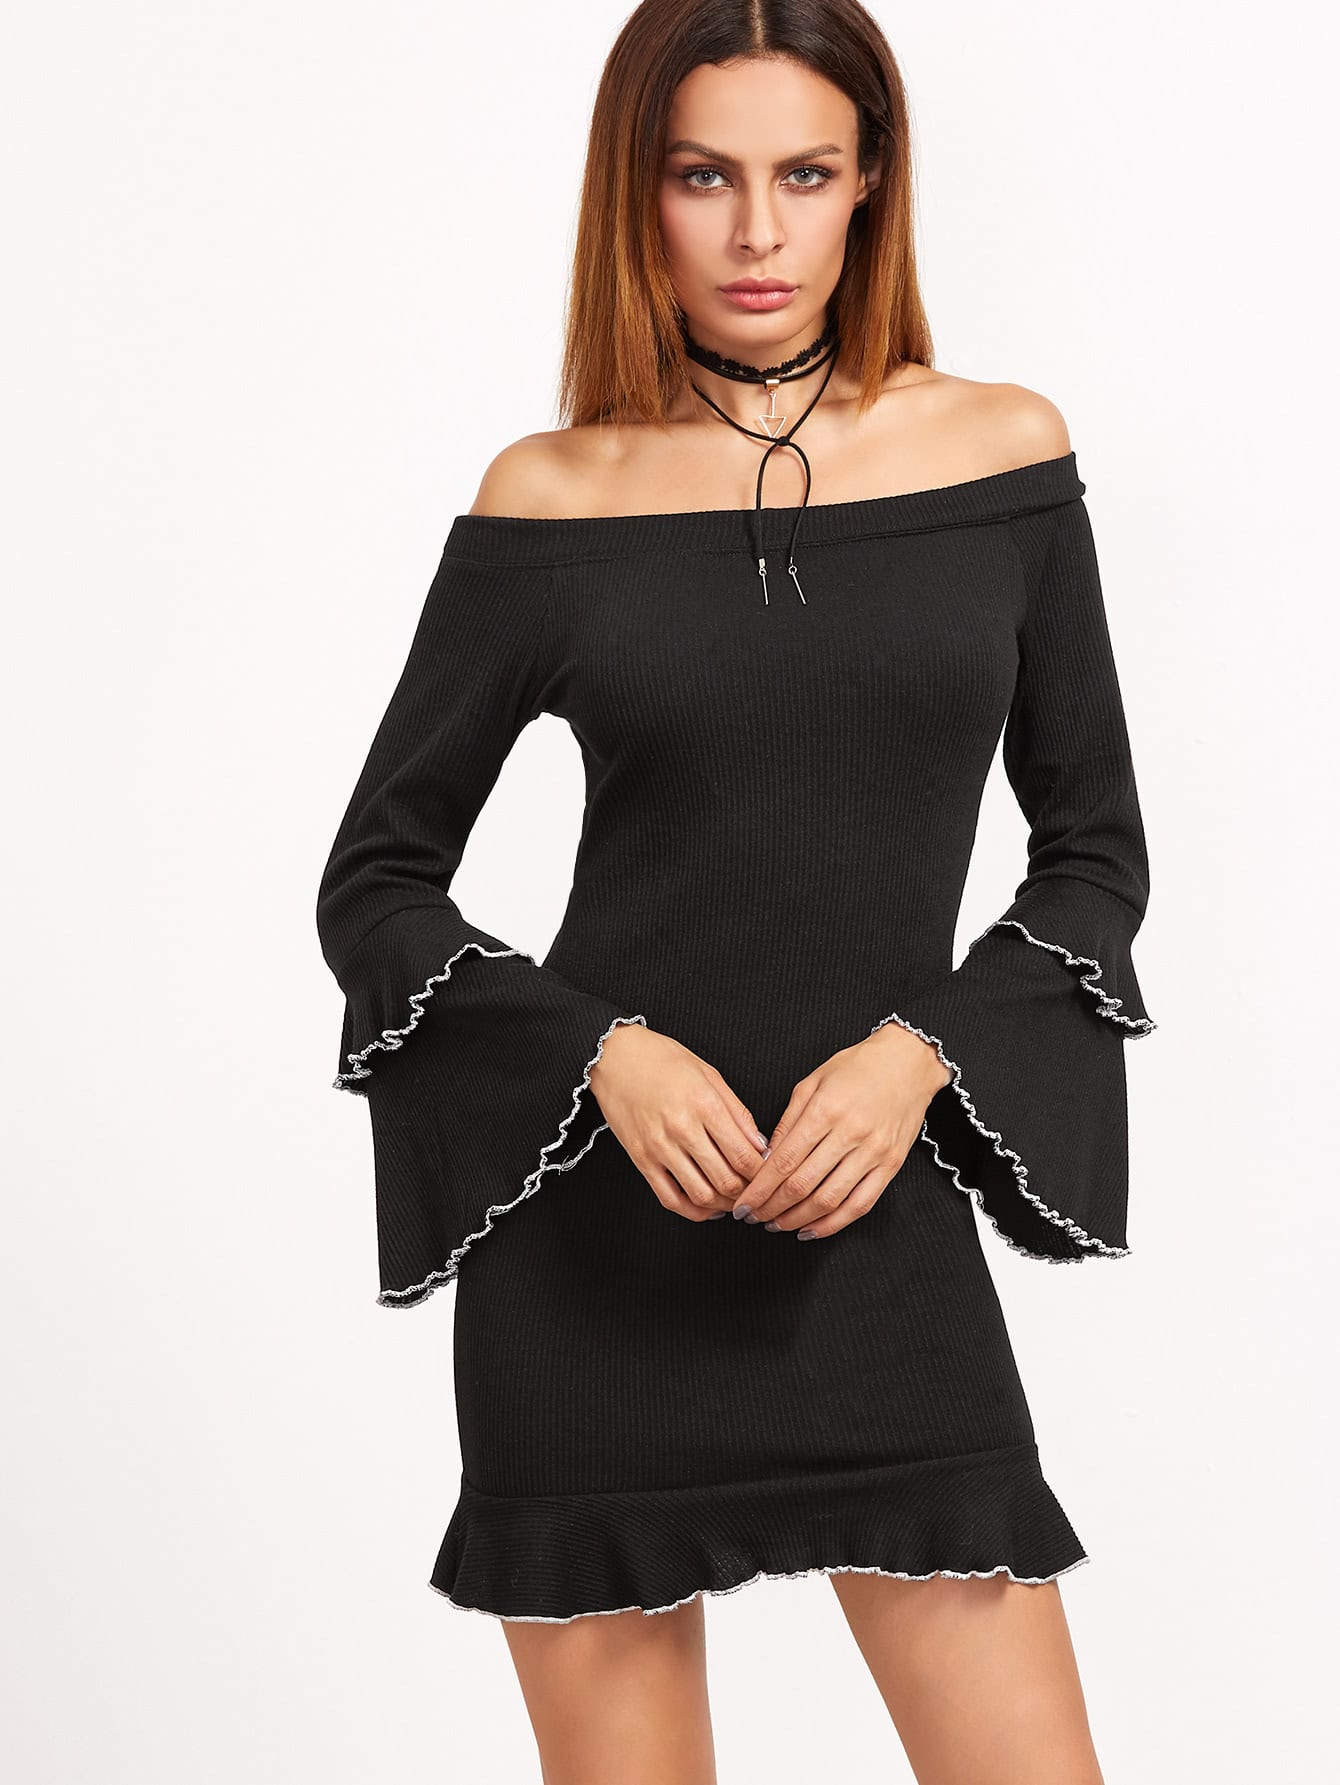 Black Ribbed Knit Off The Shoulder Ruffle Dress dress161123721